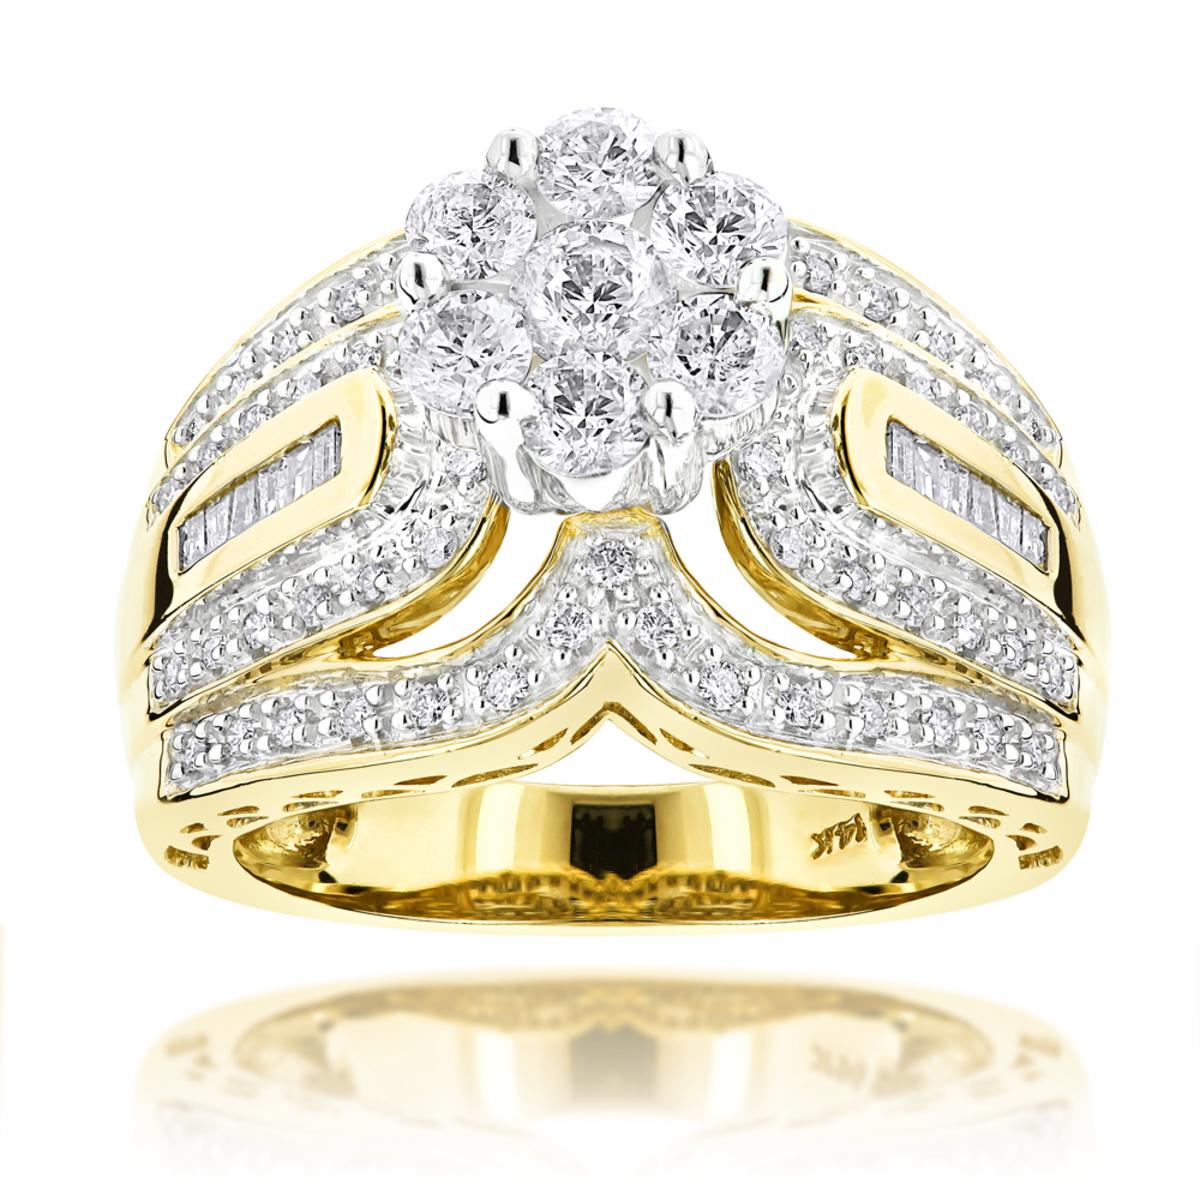 Ladies Diamond Rings 14K Cluster Diamond Ring 1.83ct